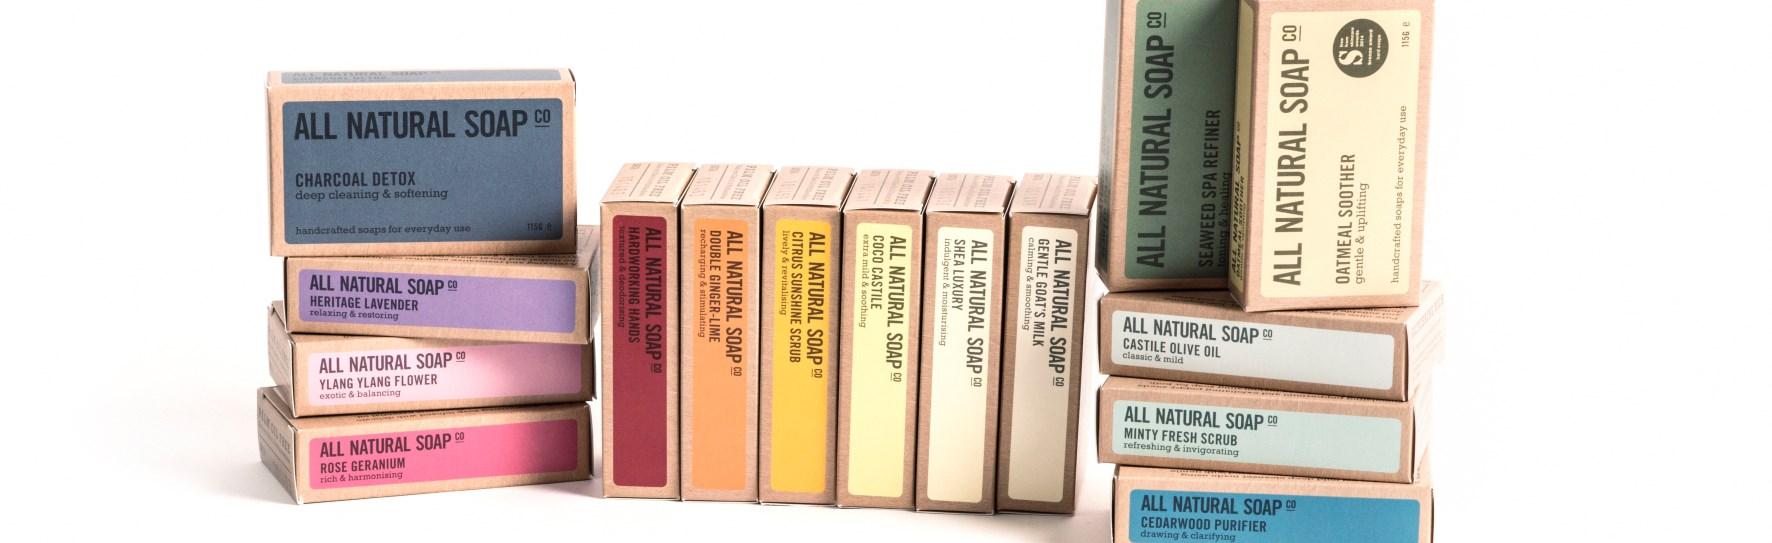 SLS-Free_ALL-NATURAL-SOAP-Co